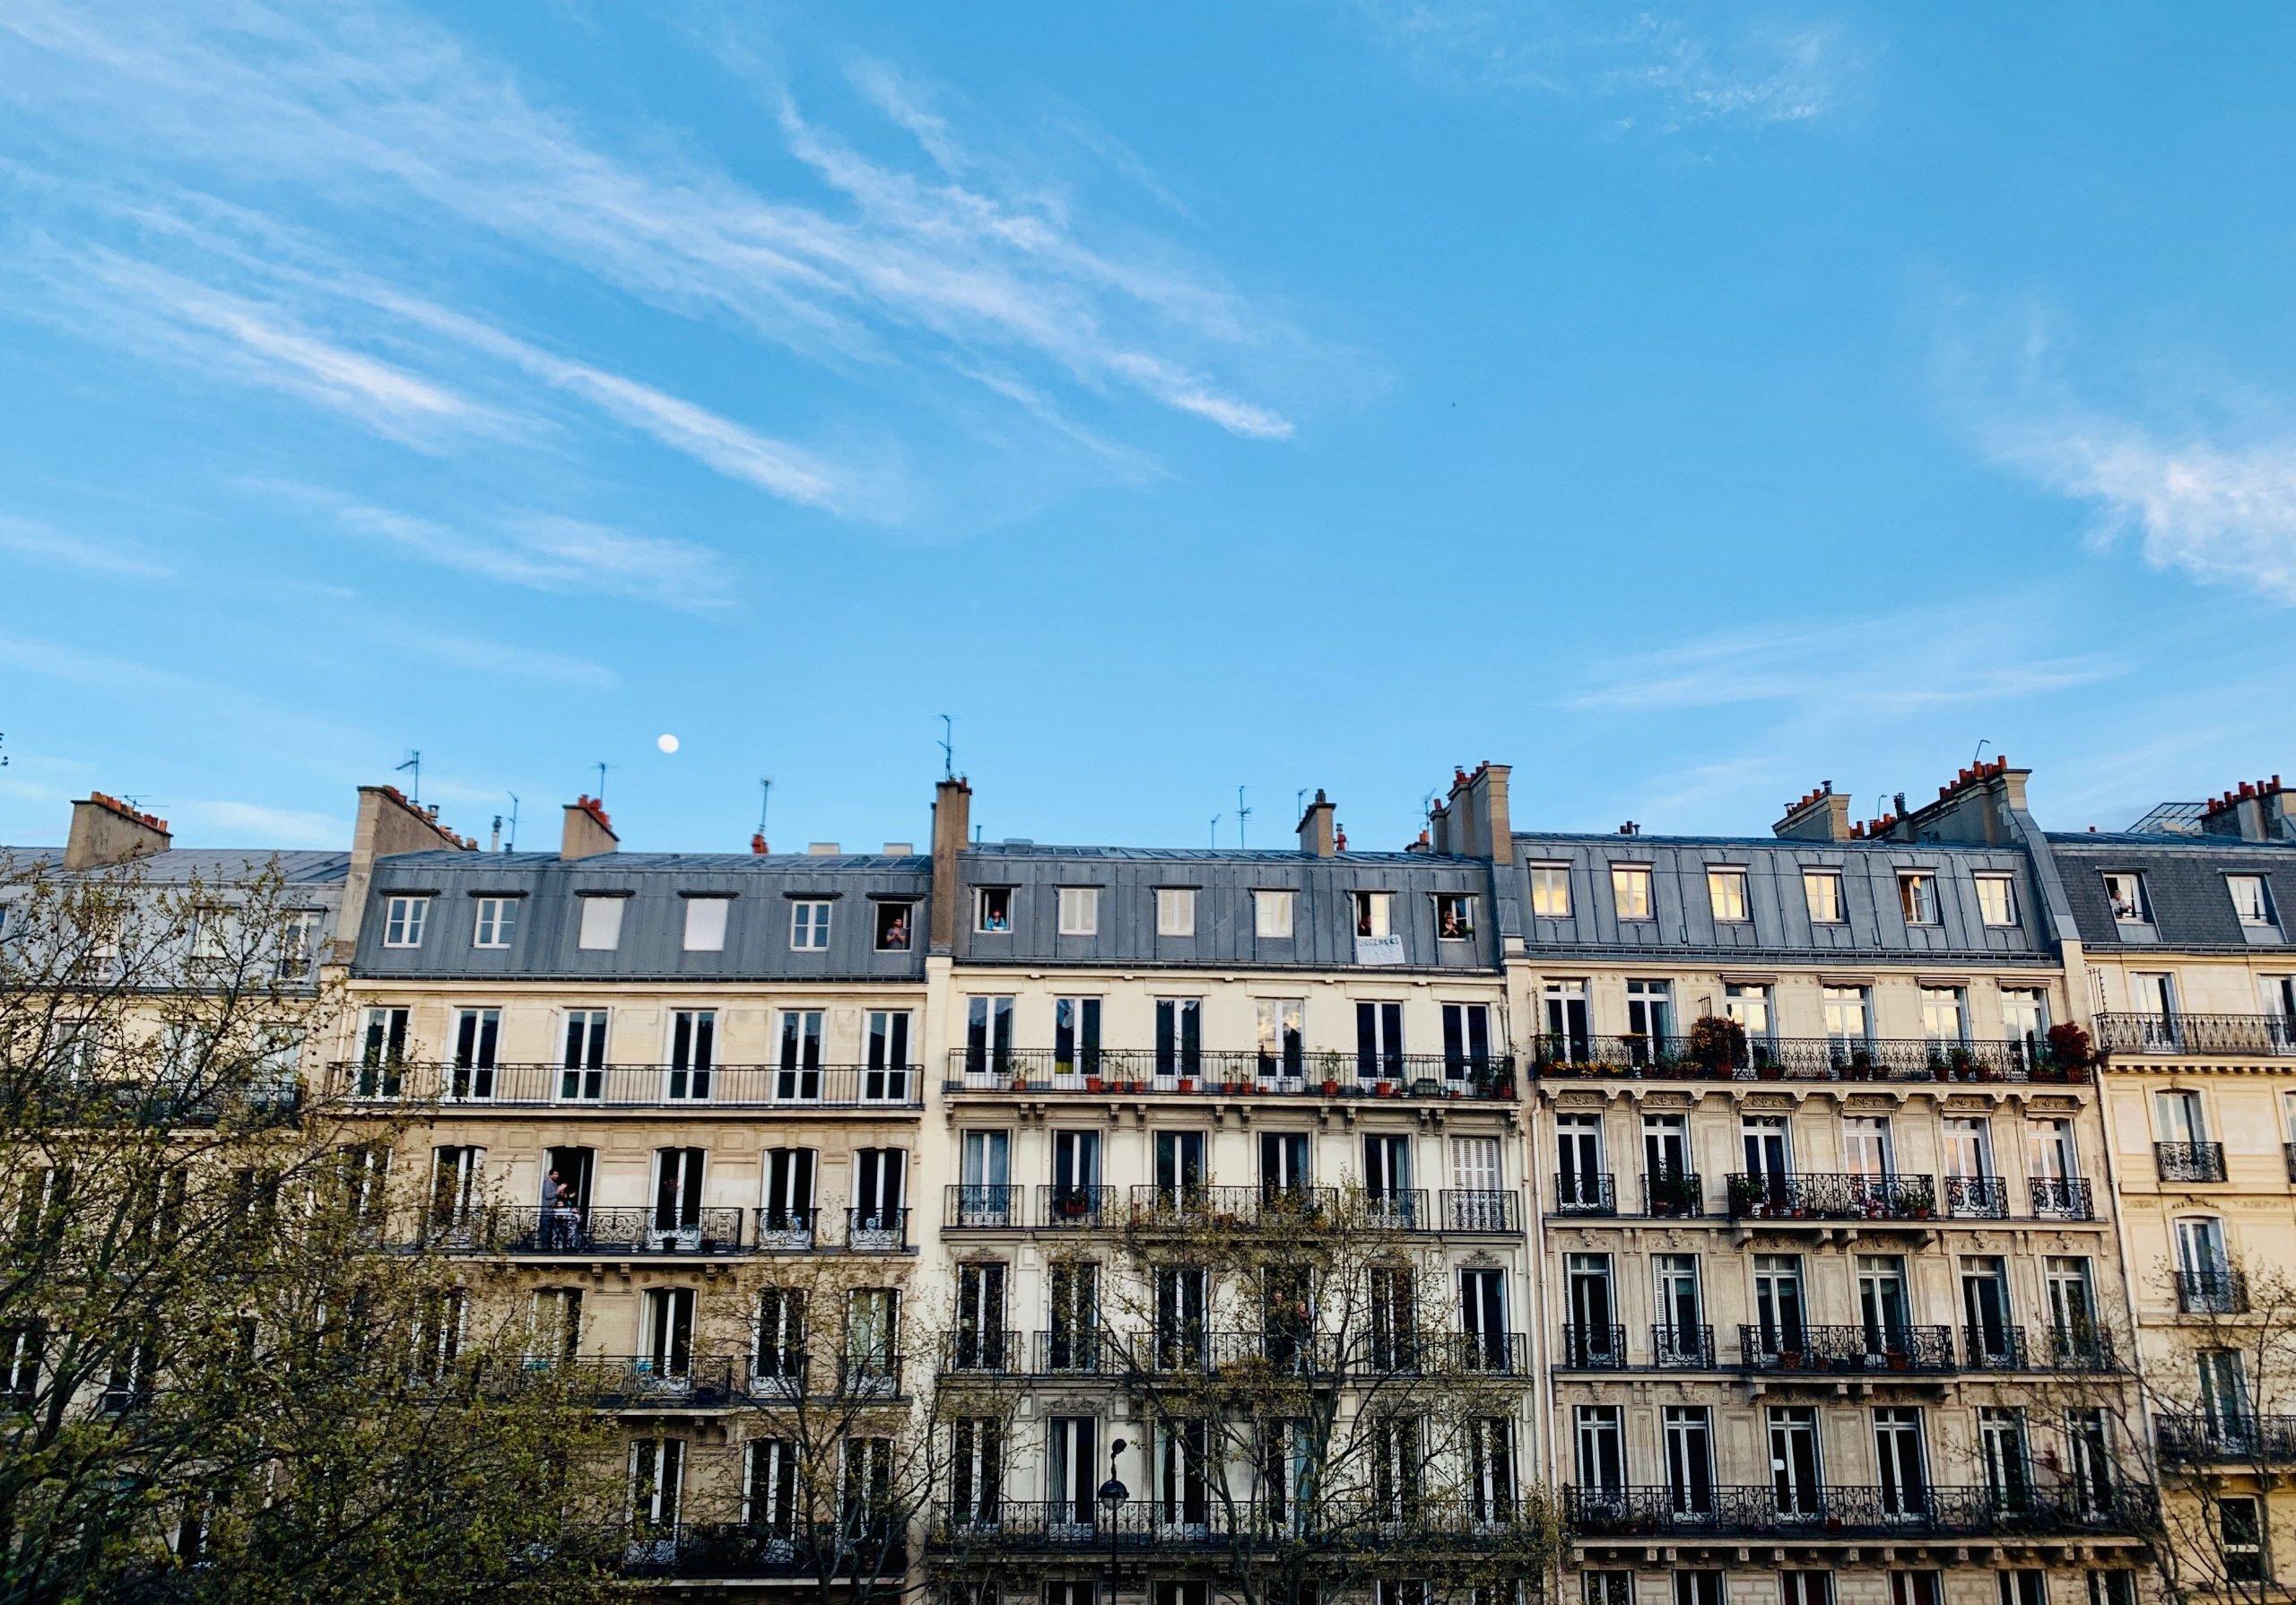 Lockdown in Paris – plus some easy recipes for kids